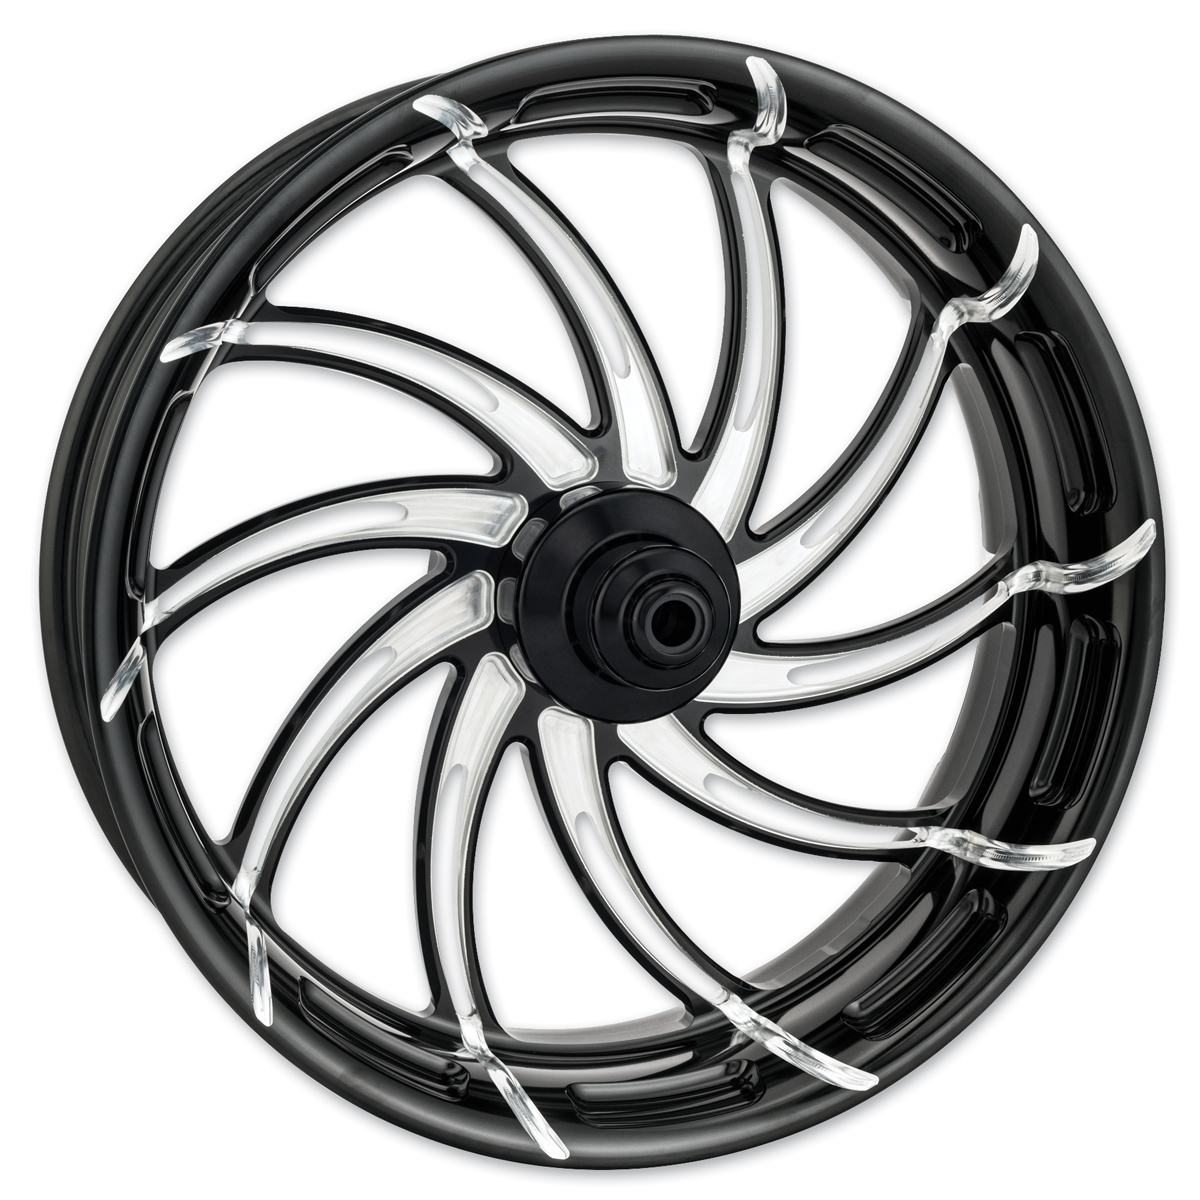 Performance Machine Supra Platinum Cut Rear Wheel 17x6 ABS